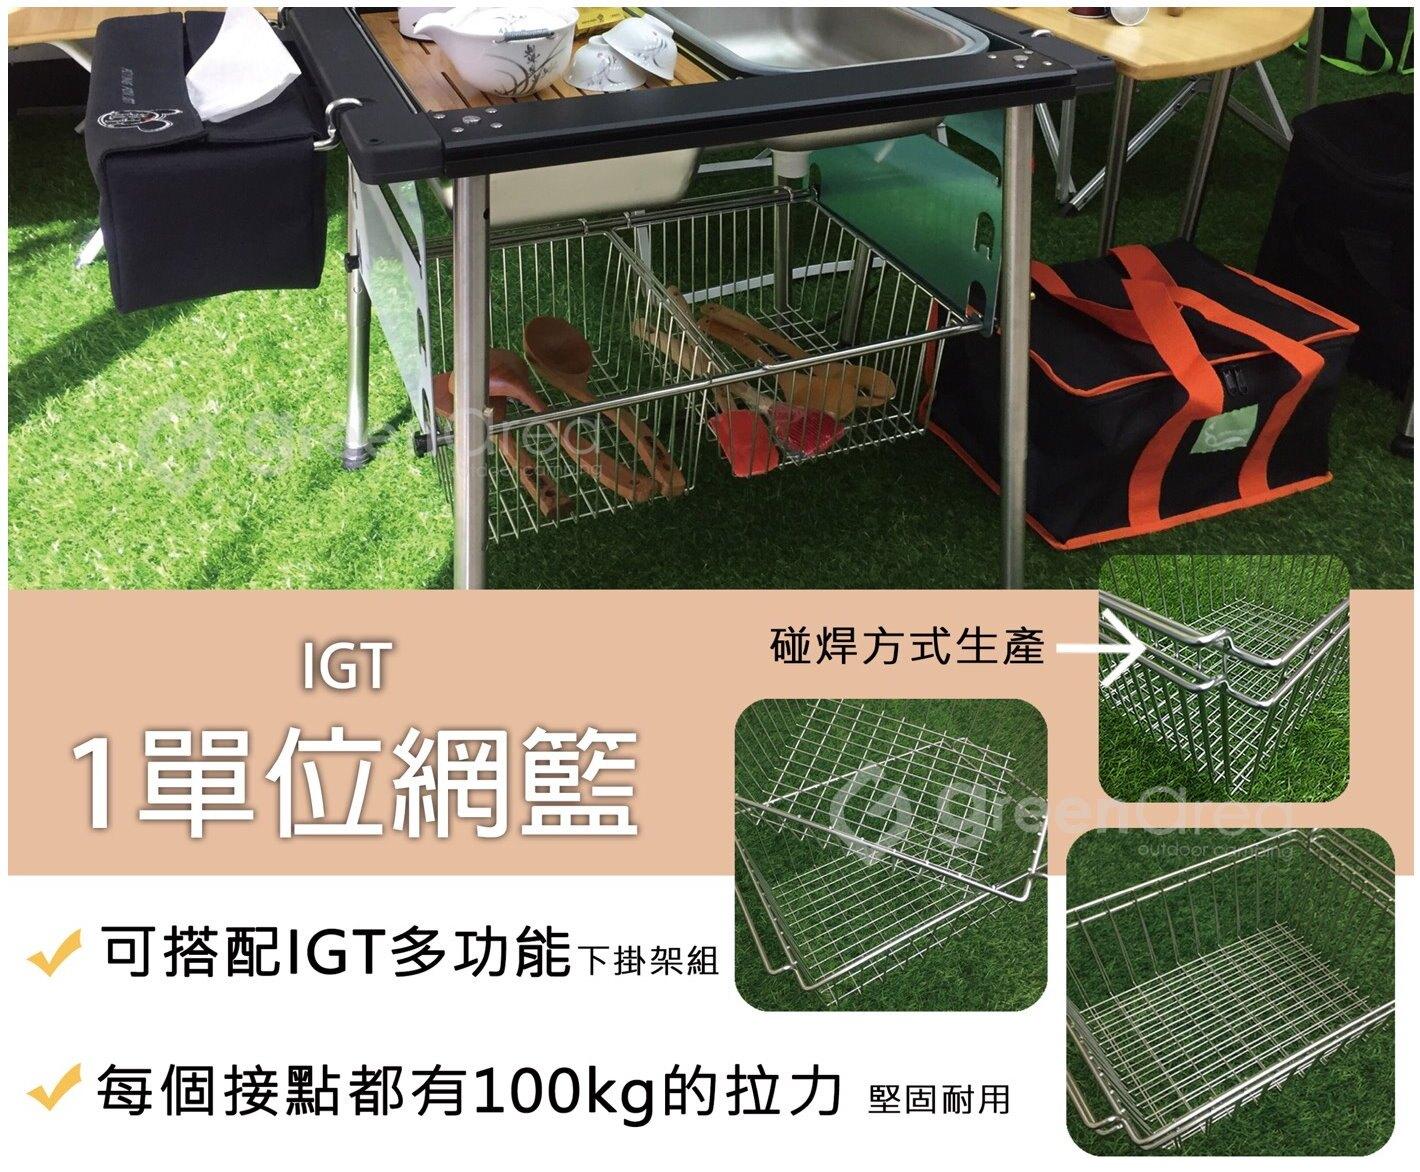 IGT 1單位瀝水籃(網籃)TB-211 (適用喜登樂/Snow peak/黑鹿等...其他所有IGT 使用)